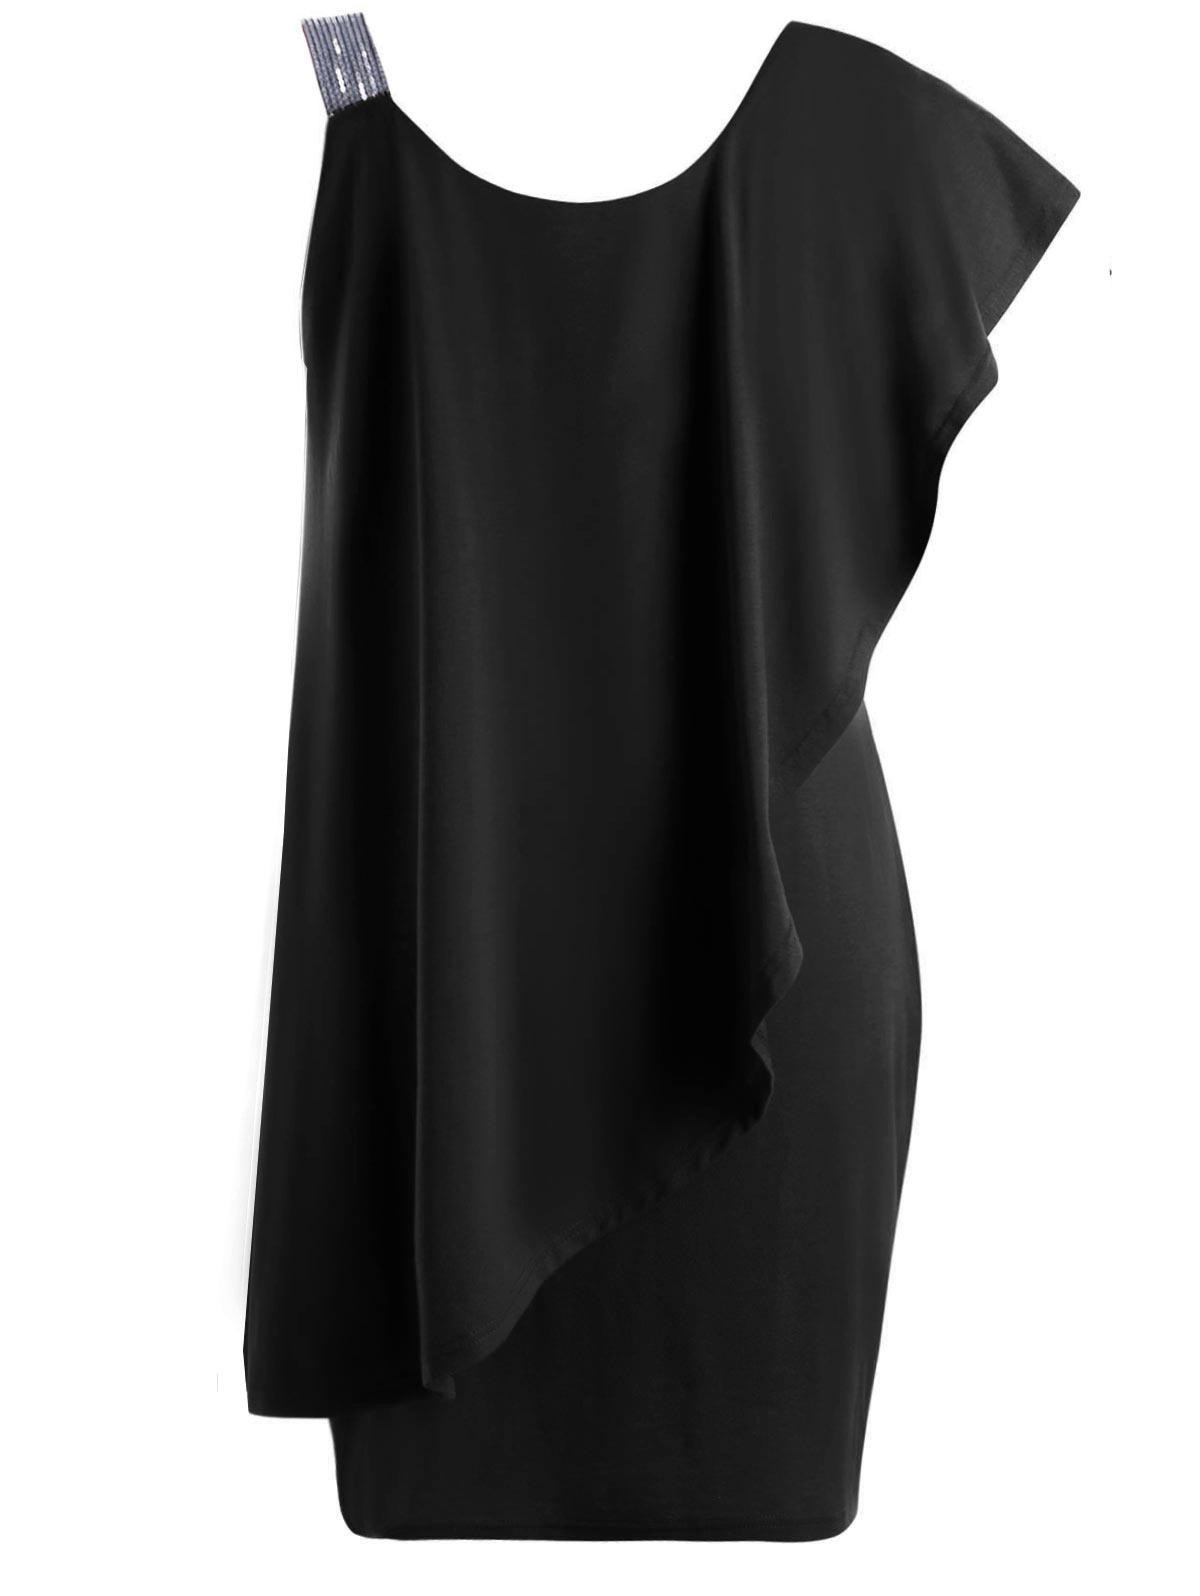 2247fcfa15c81 Gamiss 2018 Women Office Lady Dress Big Plus Size One Shoulder Flounce Mini  Dresses Casual Short Sleeves Bodycon Dress